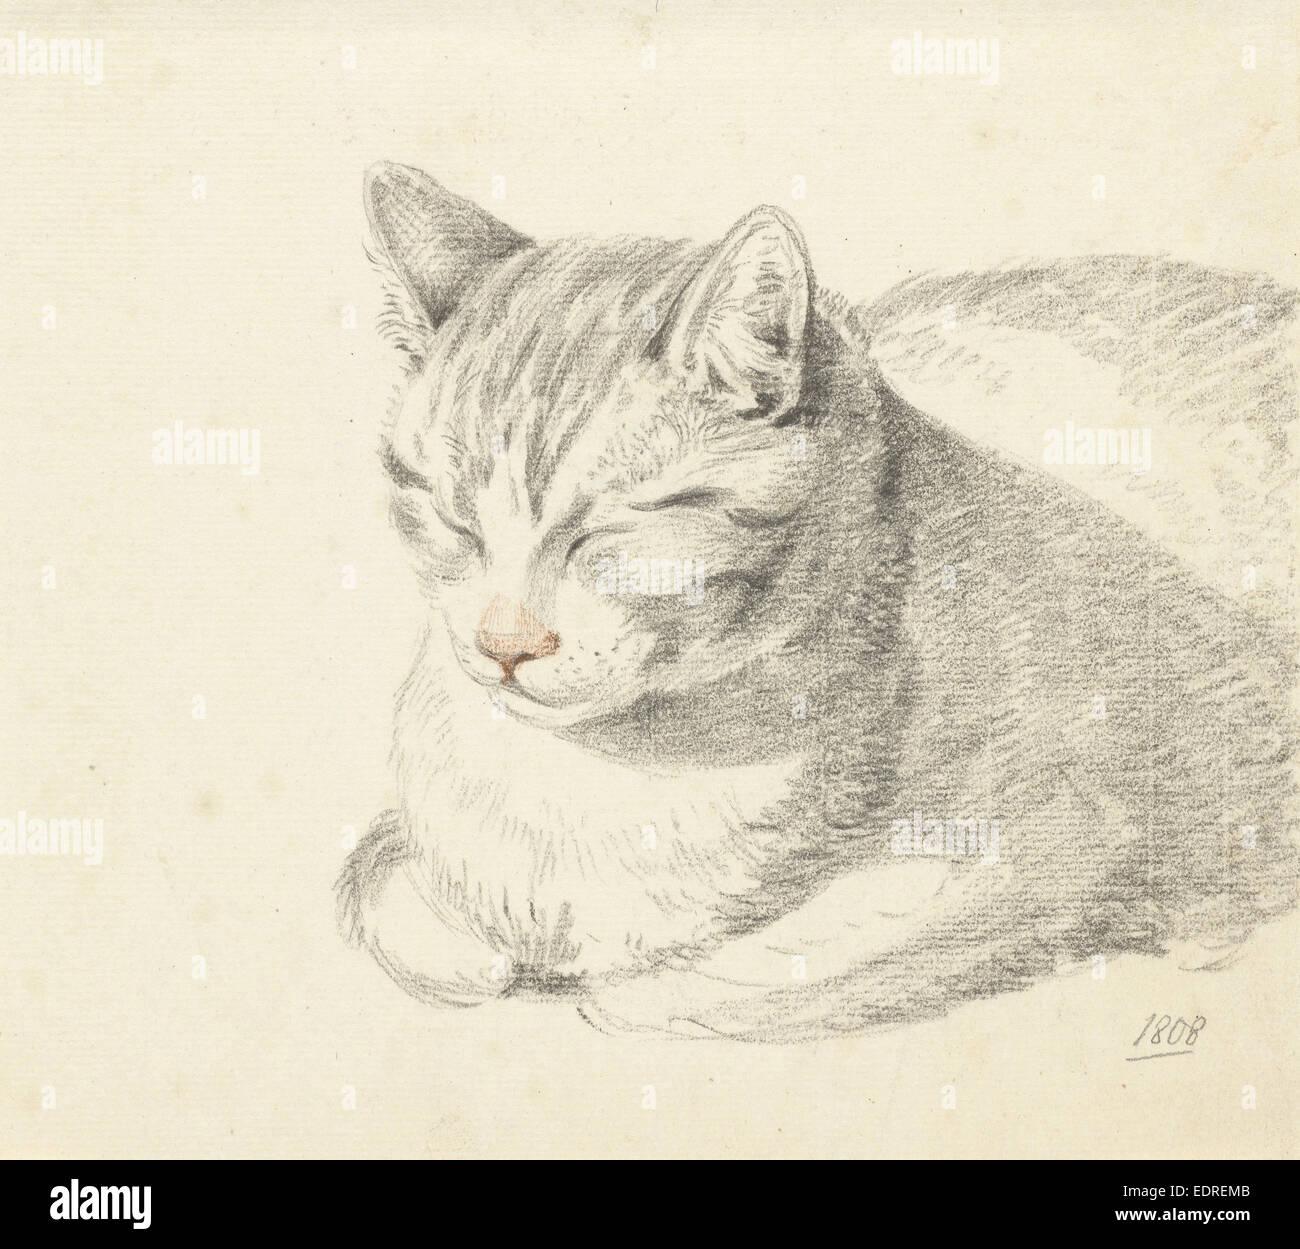 Cat, Jean Bernard, 1808 - Stock Image